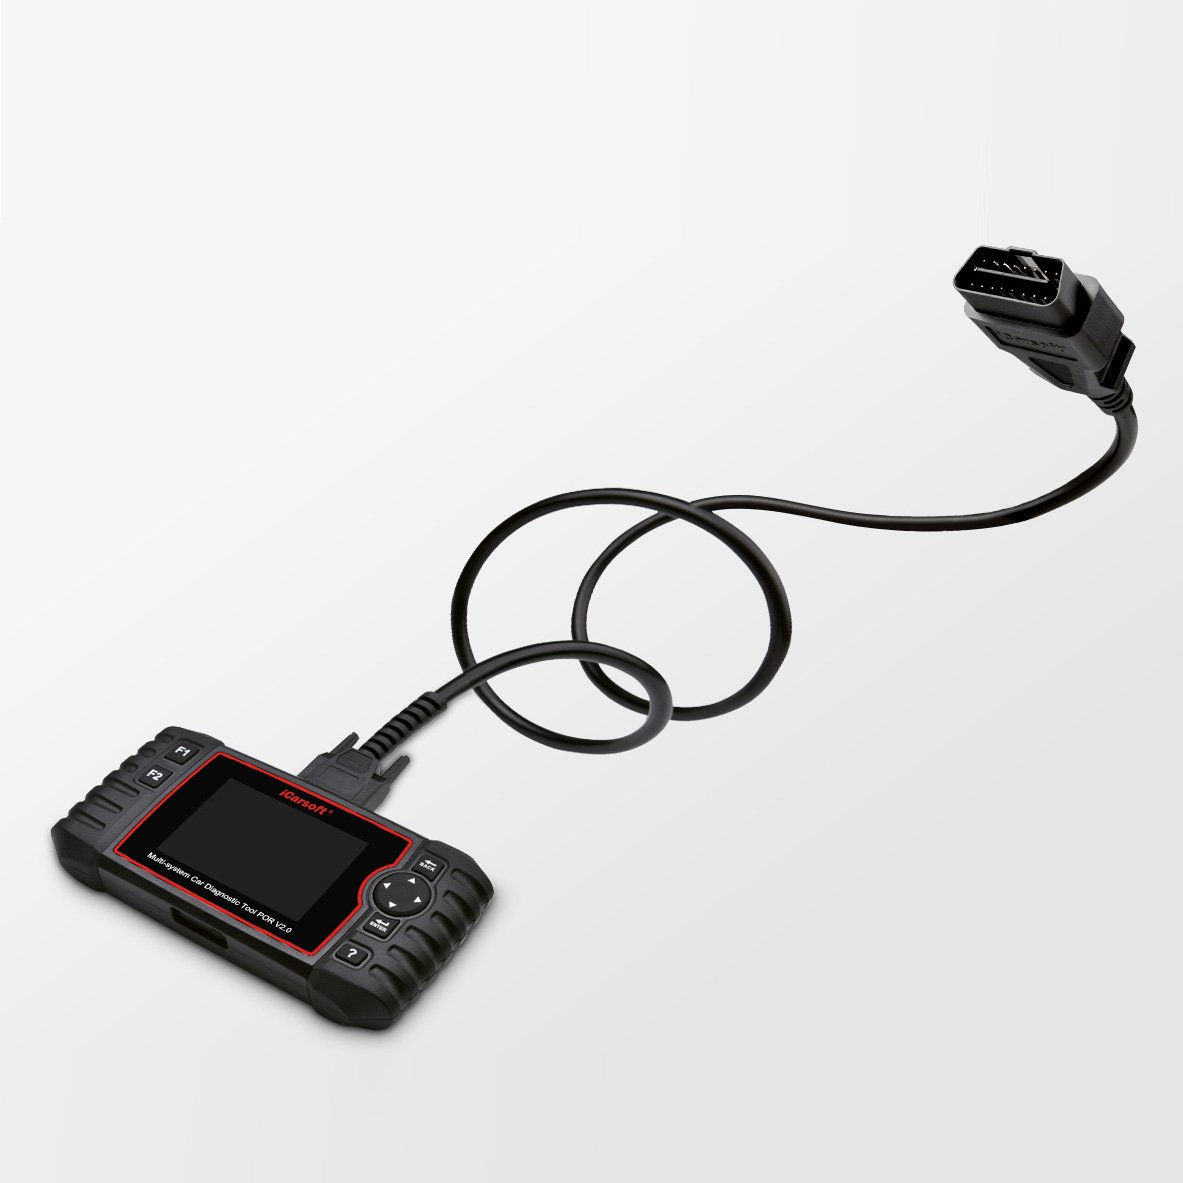 iCarsoft Auto Diagnostic Scanner POR V2.0 for Porsche with ABS Scan,Oil Service Reset ect